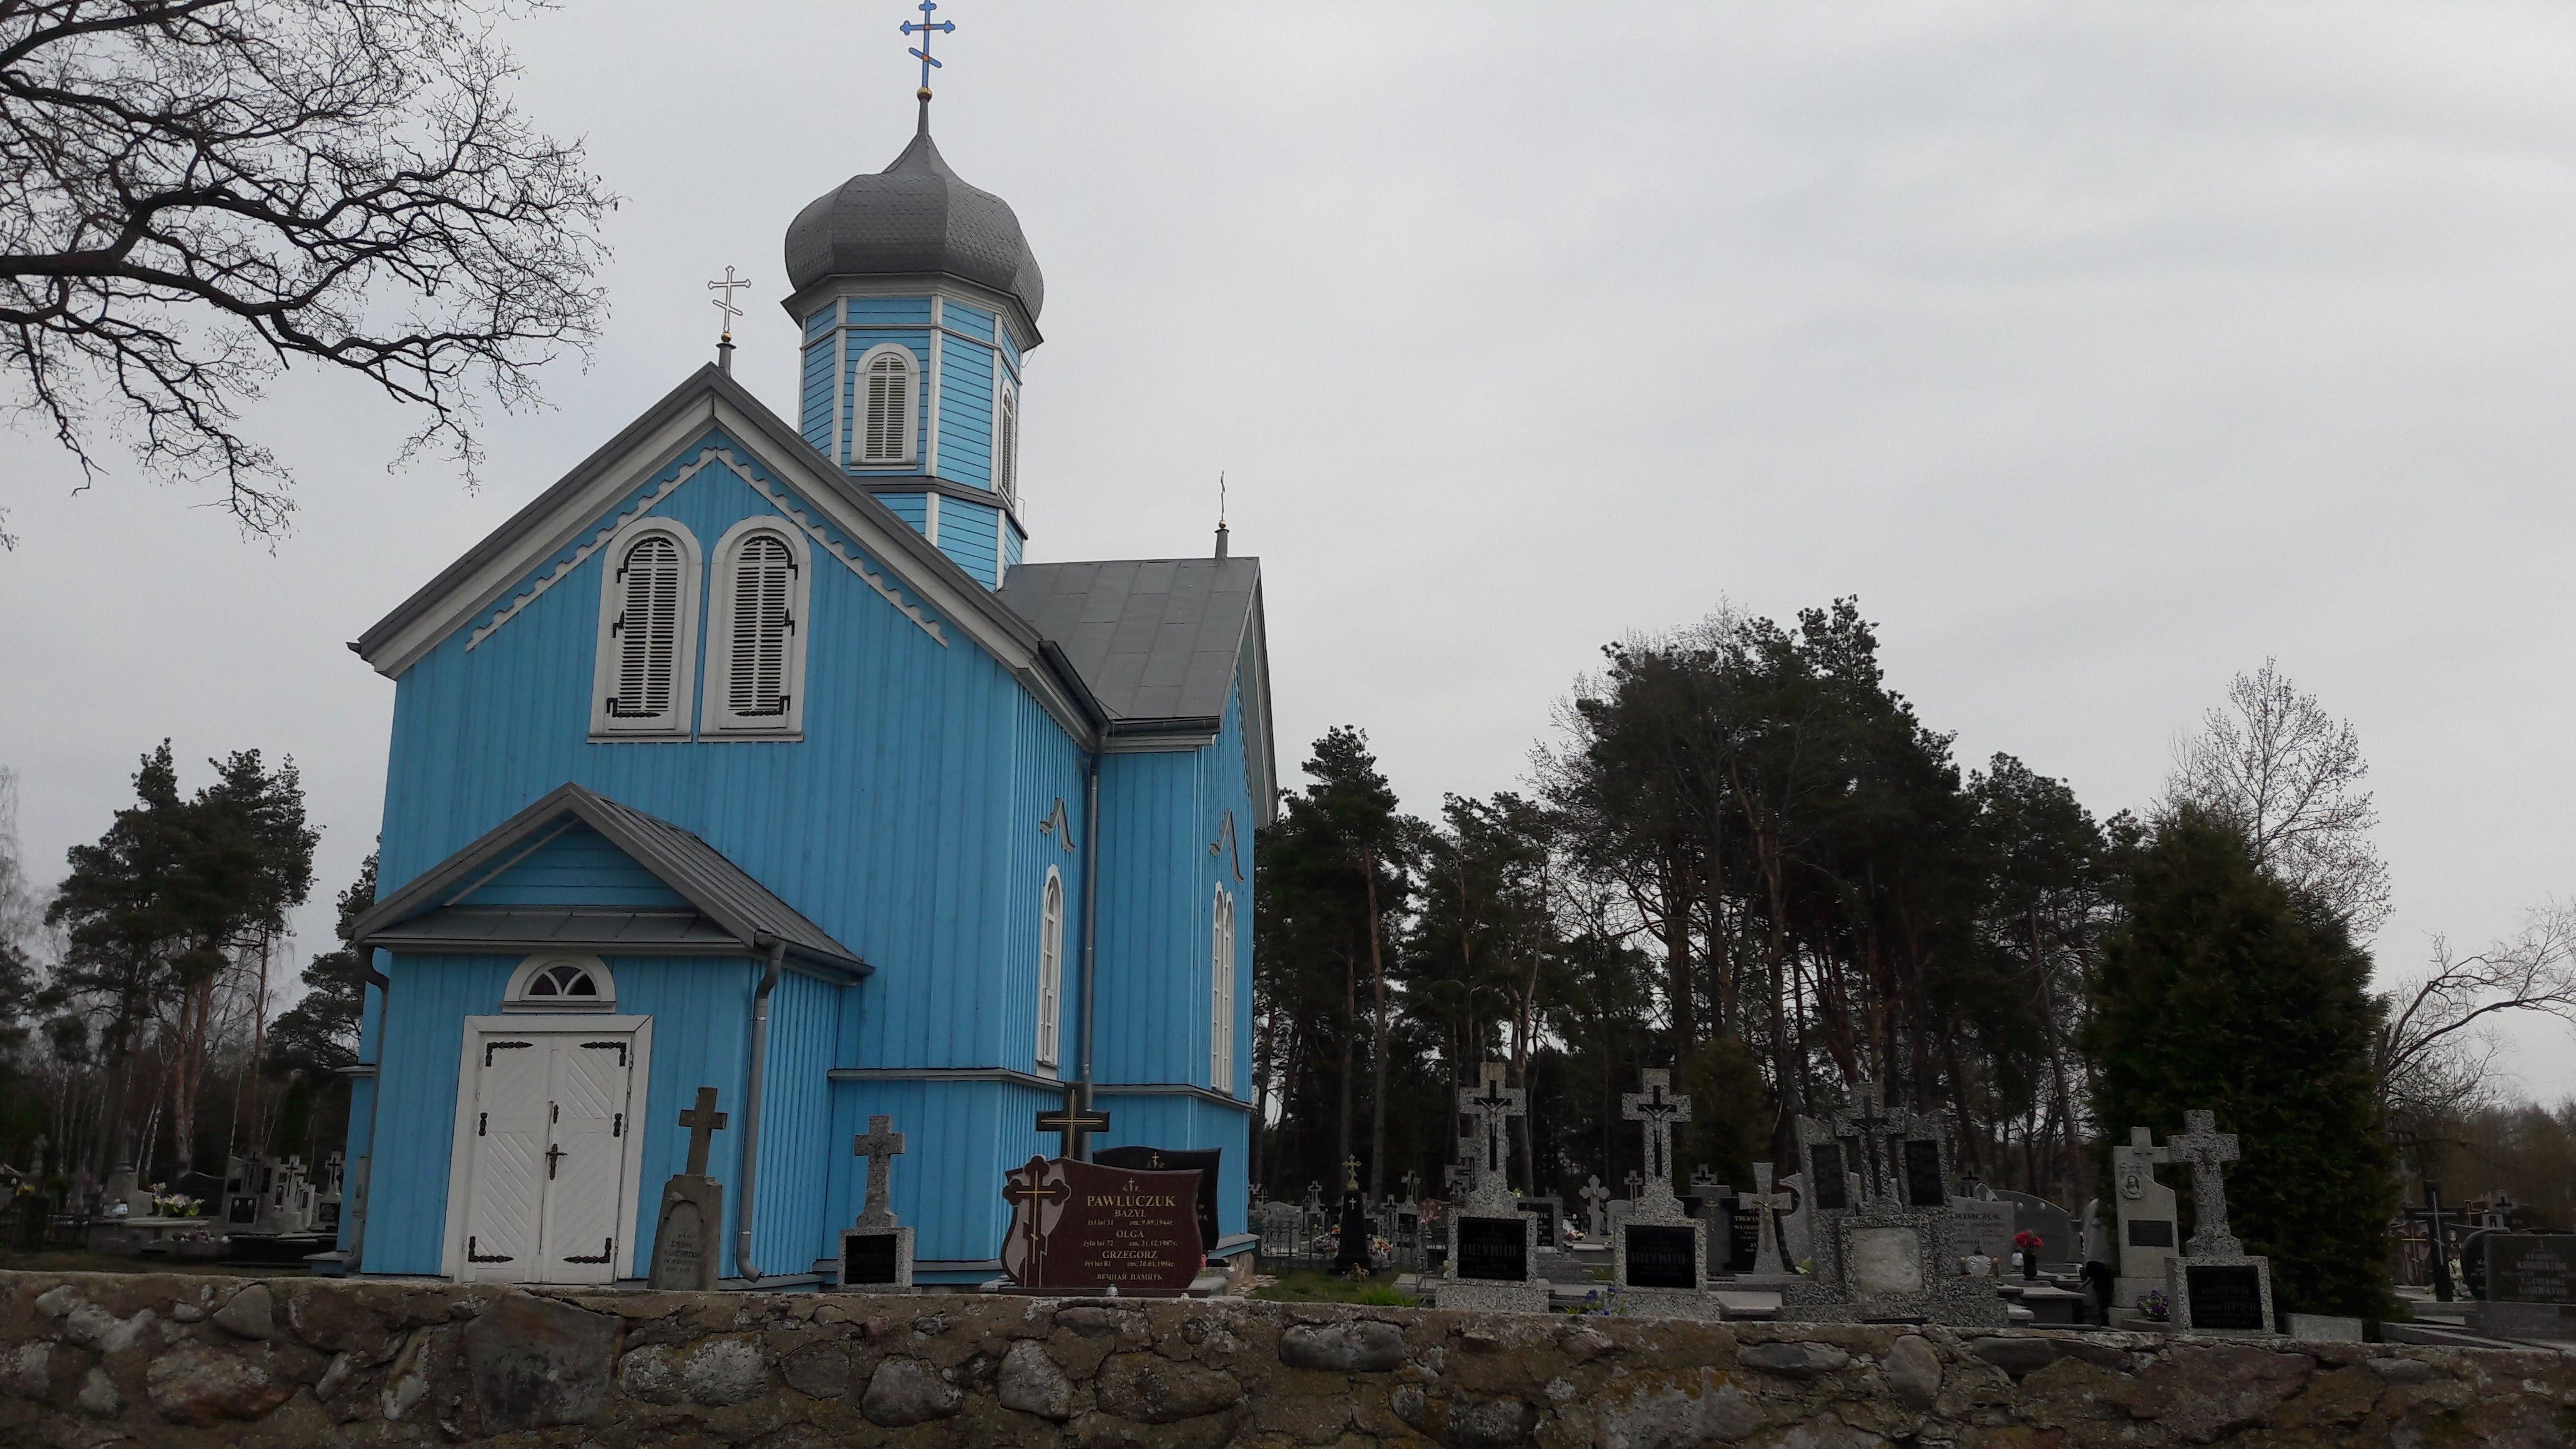 Eglise Route Bialowieza /Bielsk Podlaski/Bialystok/Monk